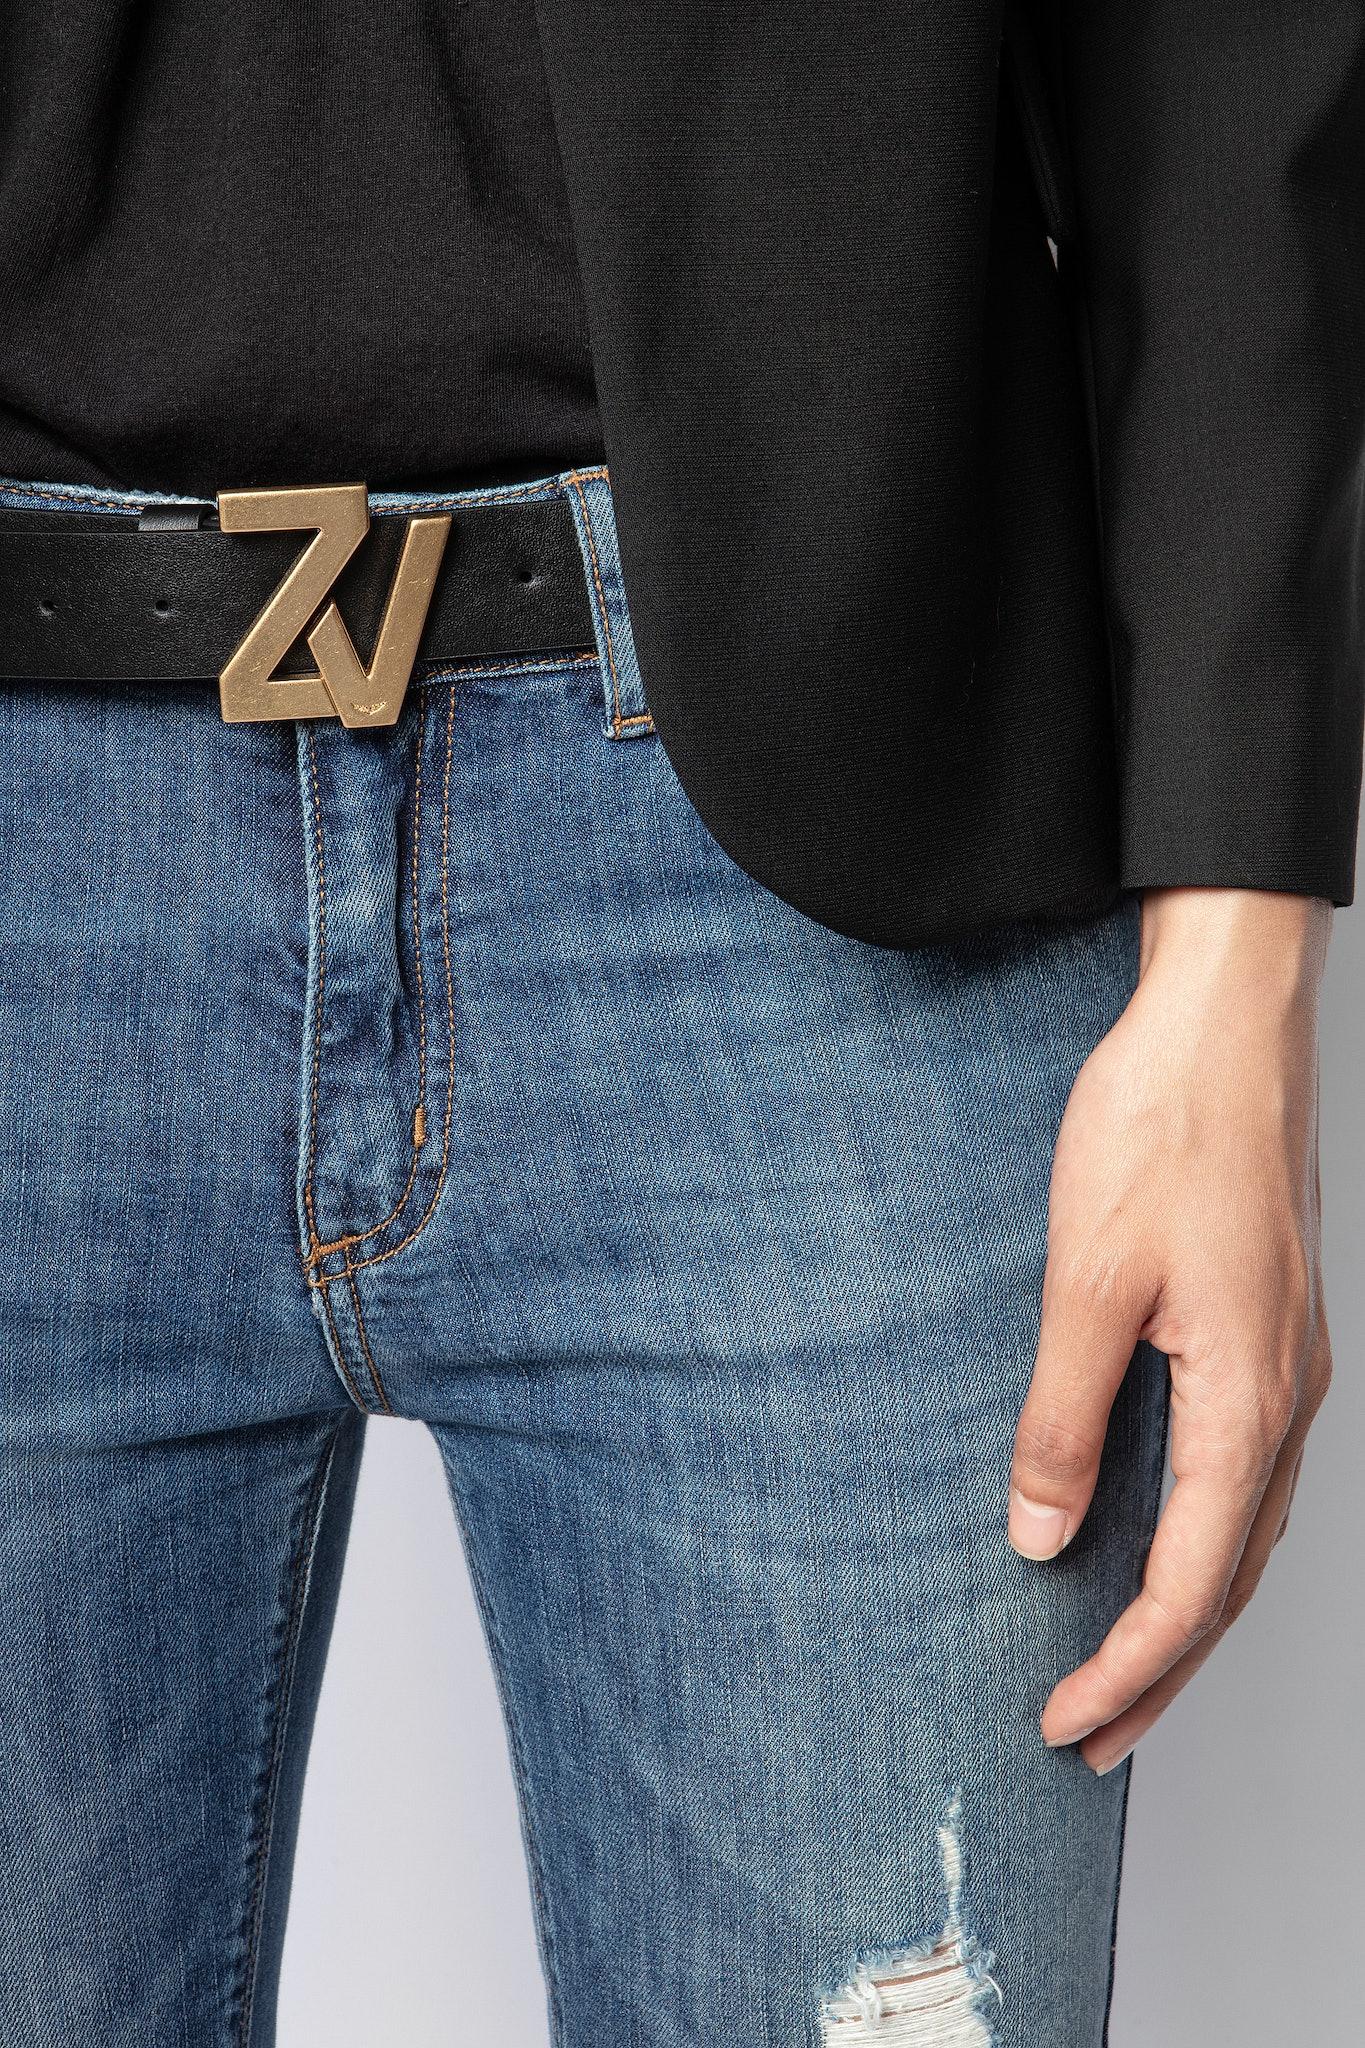 ZV Initiale Belt